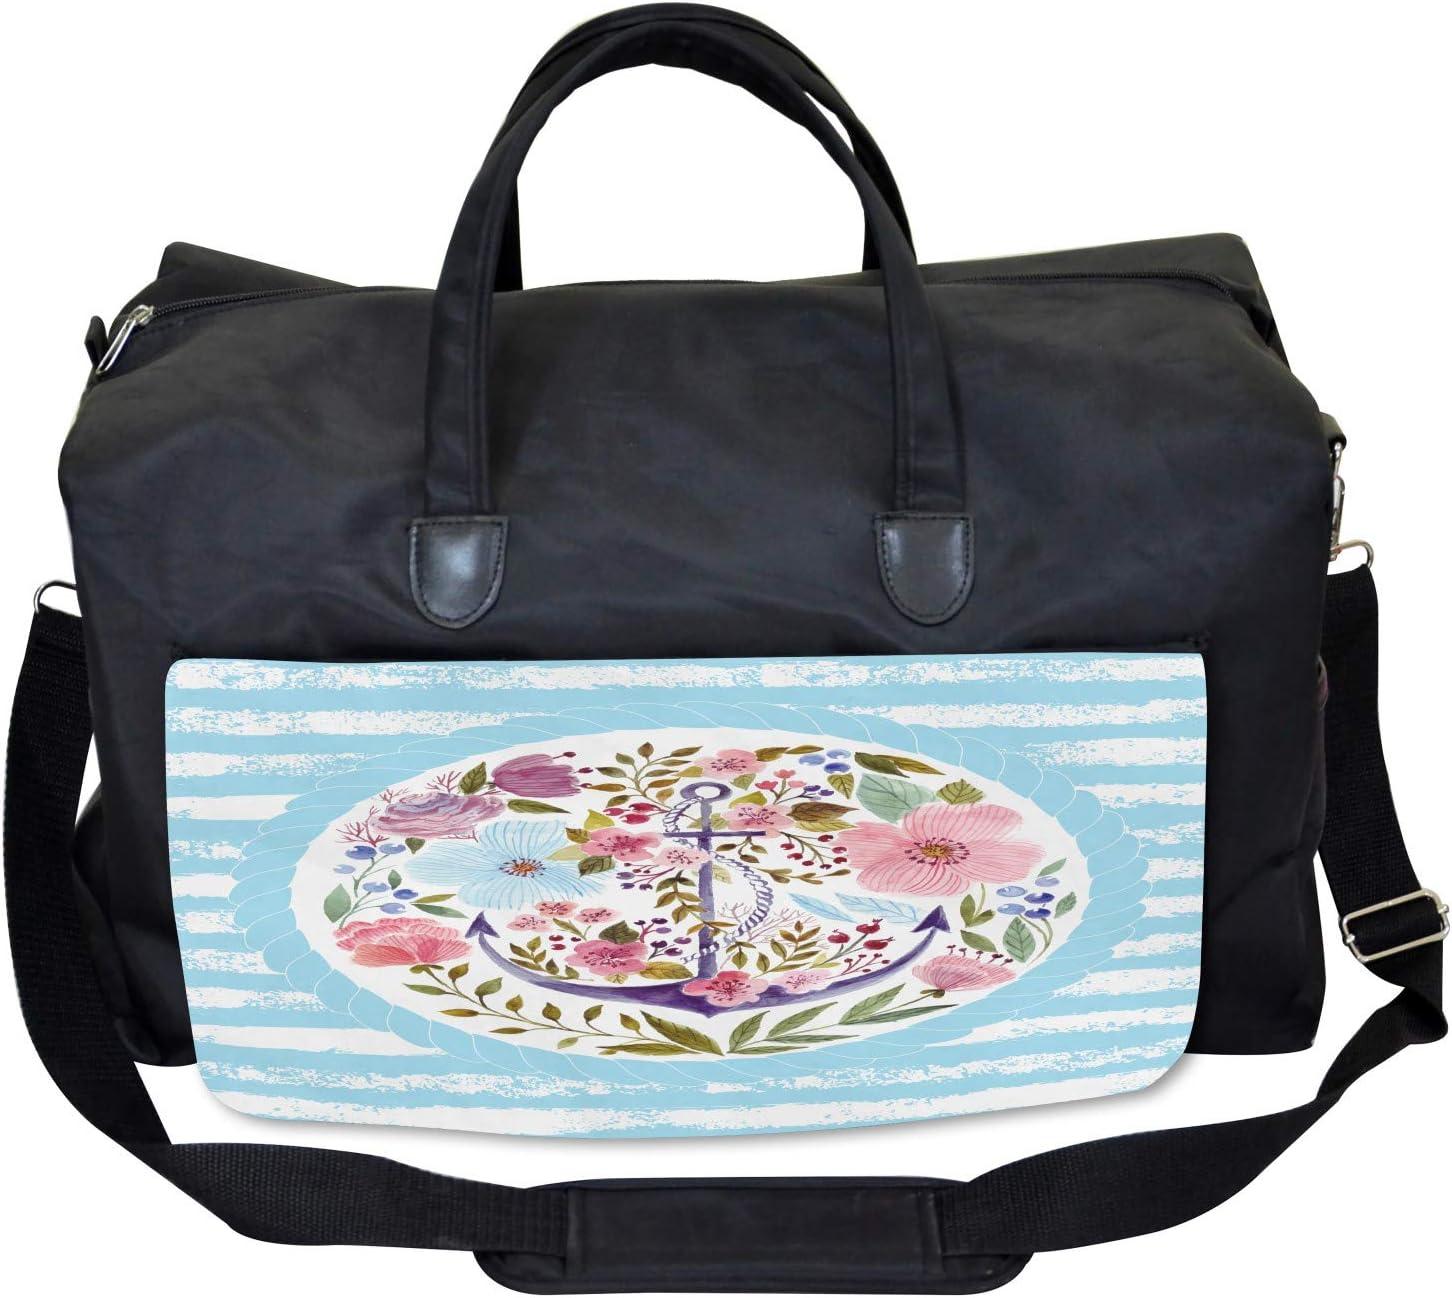 Large Weekender Carry-on Ambesonne Vintage Gym Bag Nautical Anchor Marine